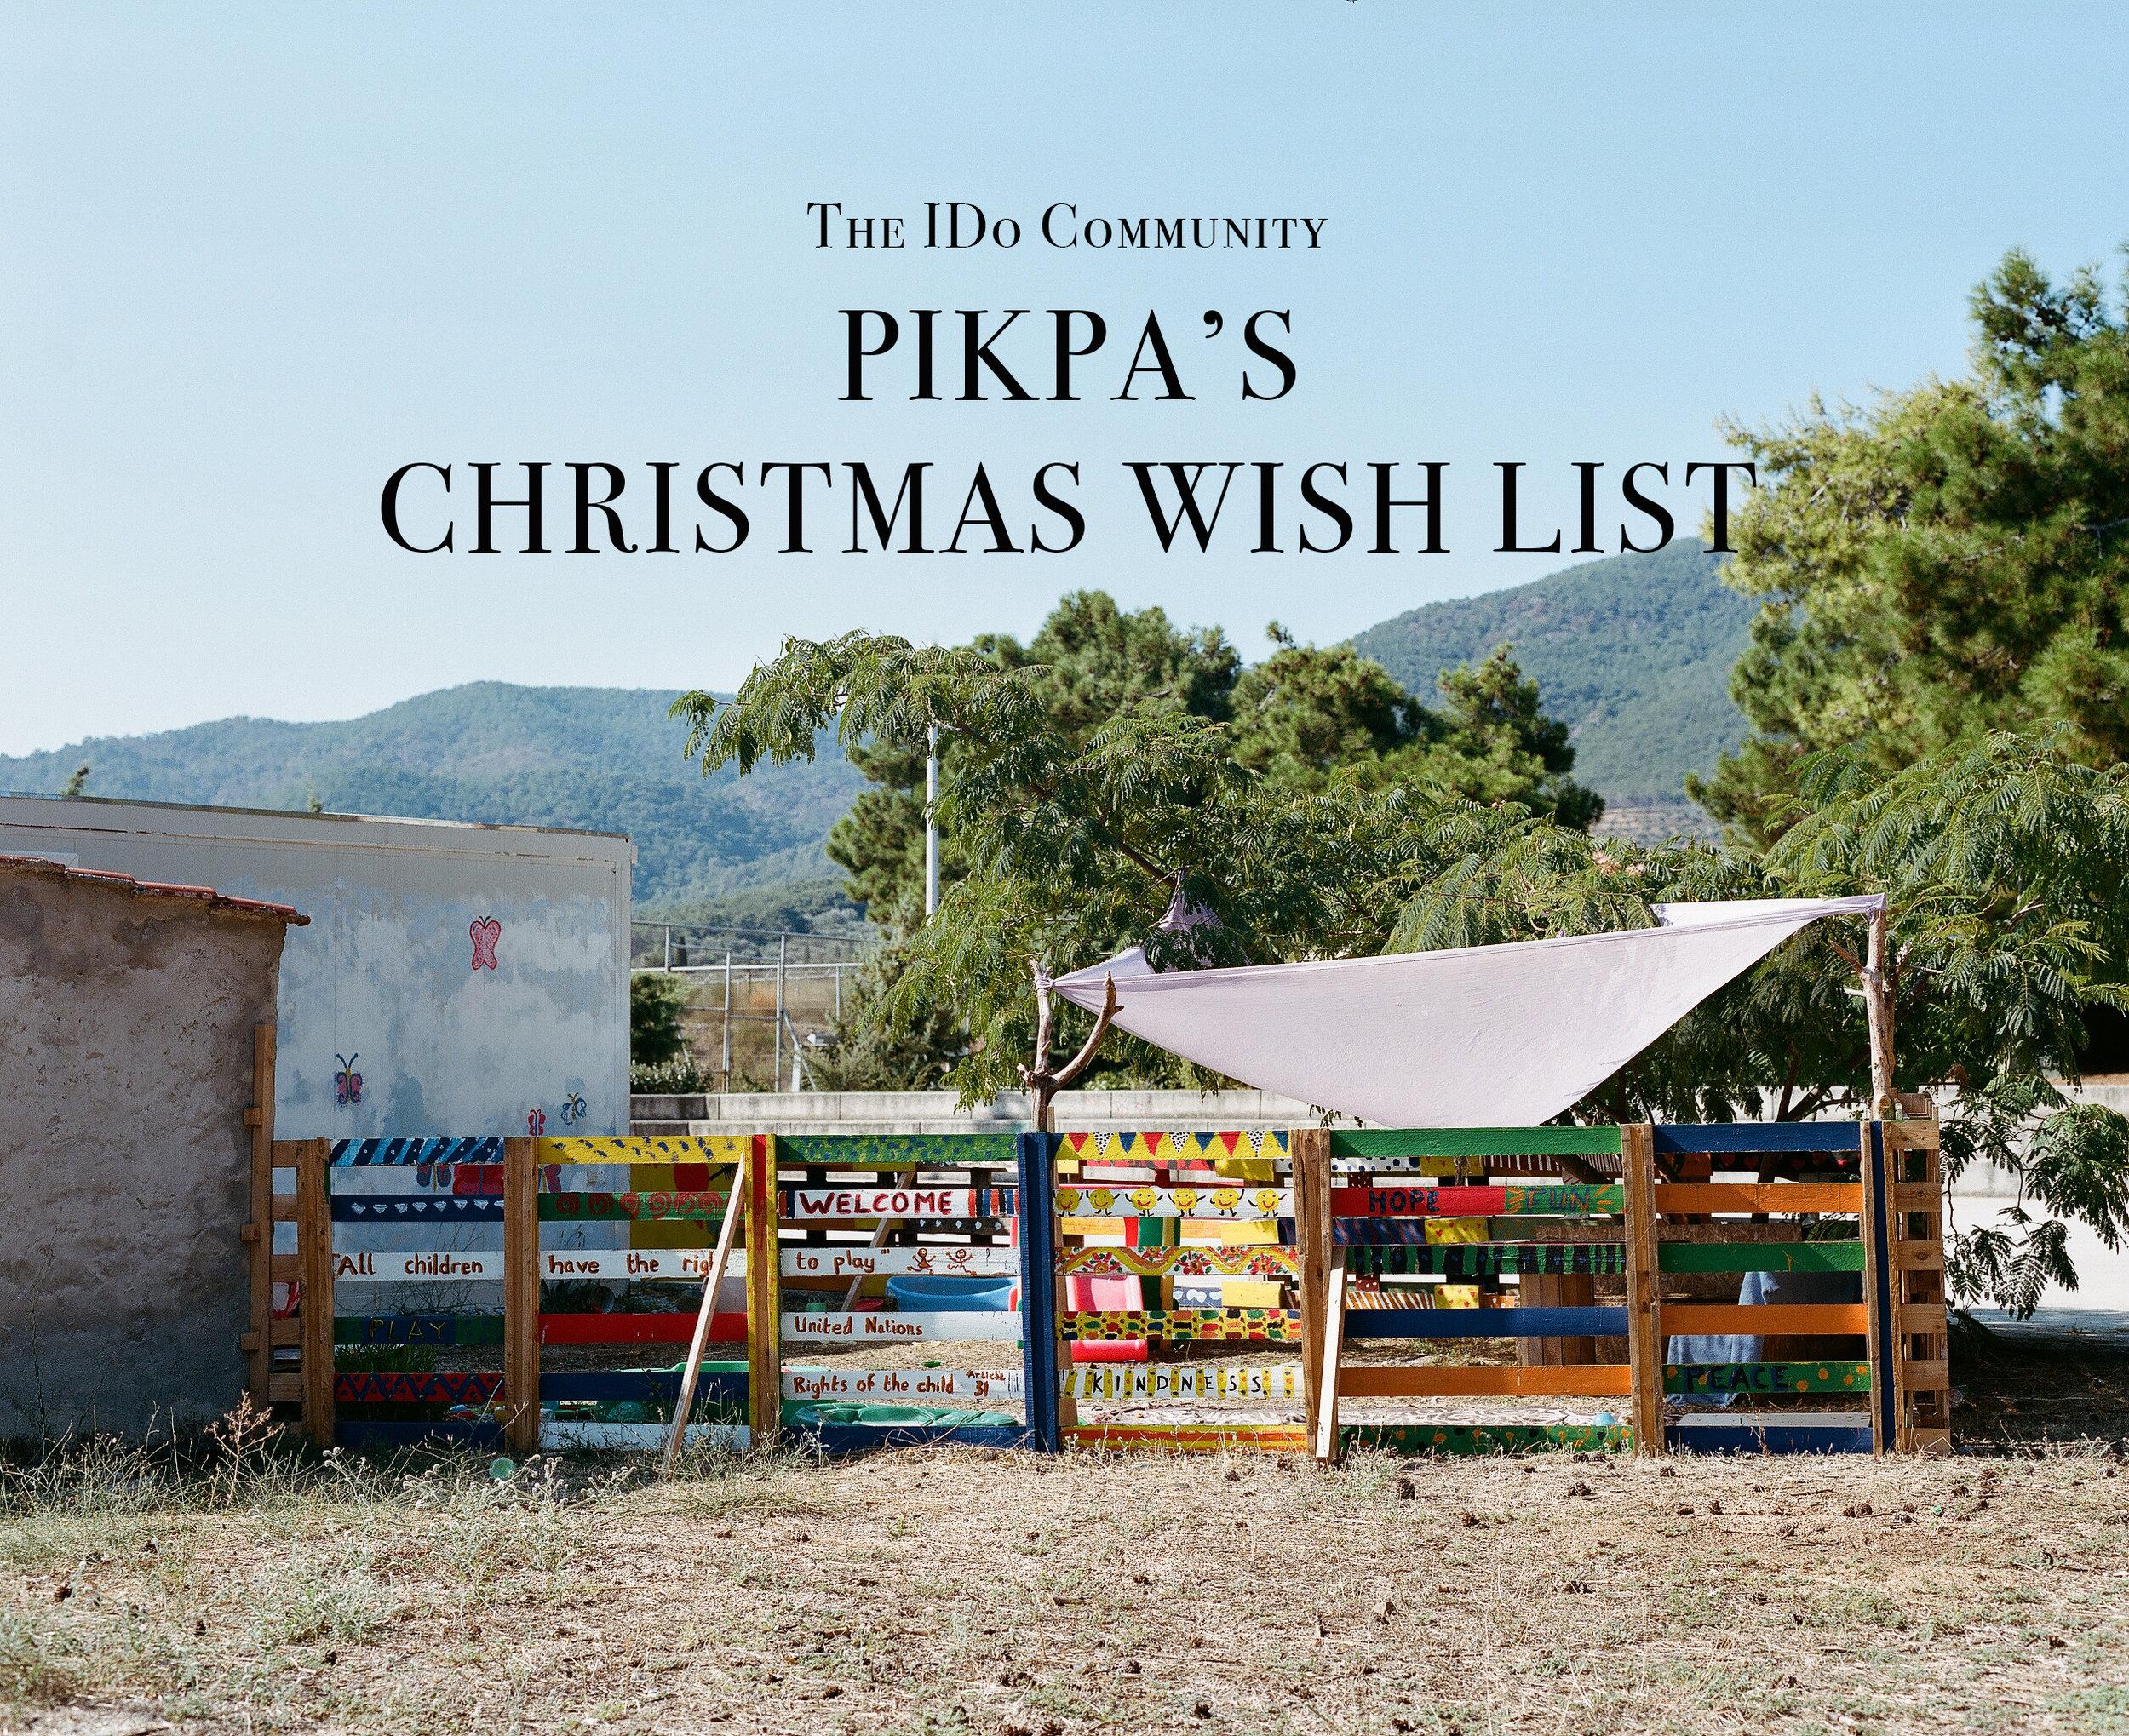 PIKPA CHRISTMAS WISH LIST XMAS CARD.jpg